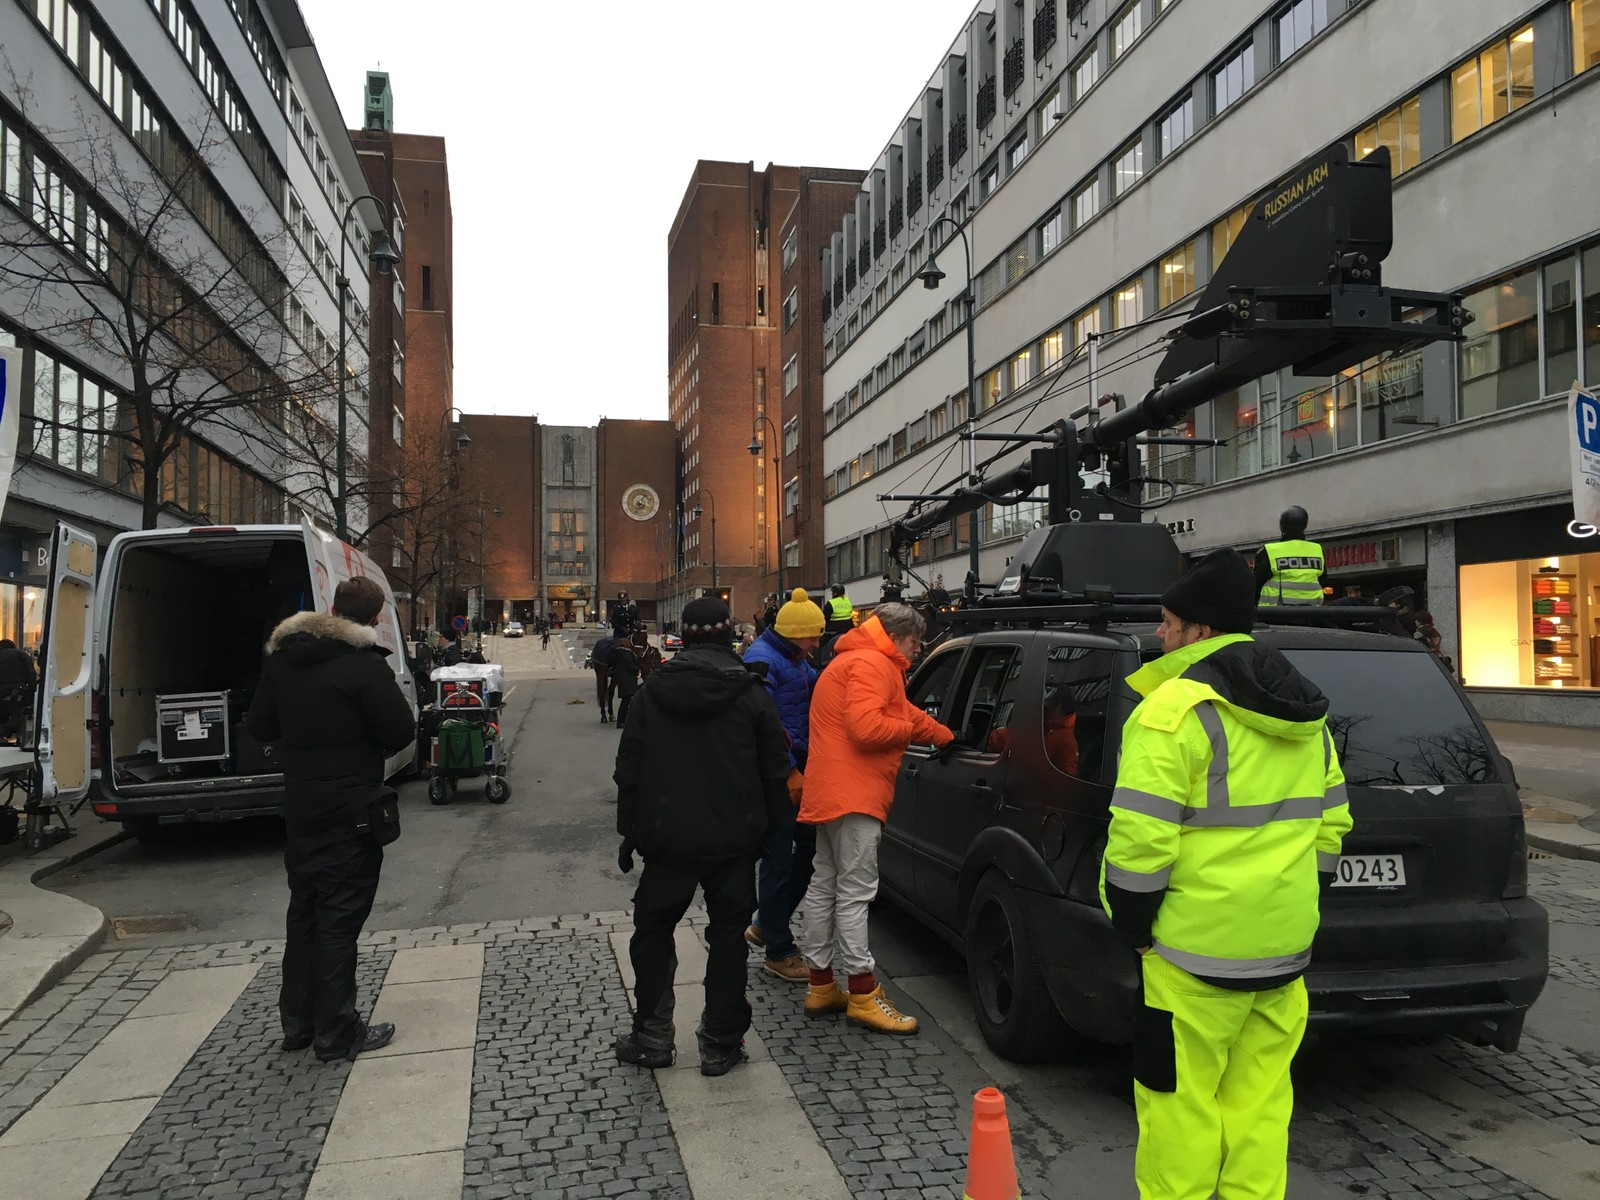 Snømannen-regissør Tomas Alfredsson (oransje jakke) under filminnspilling fredag.